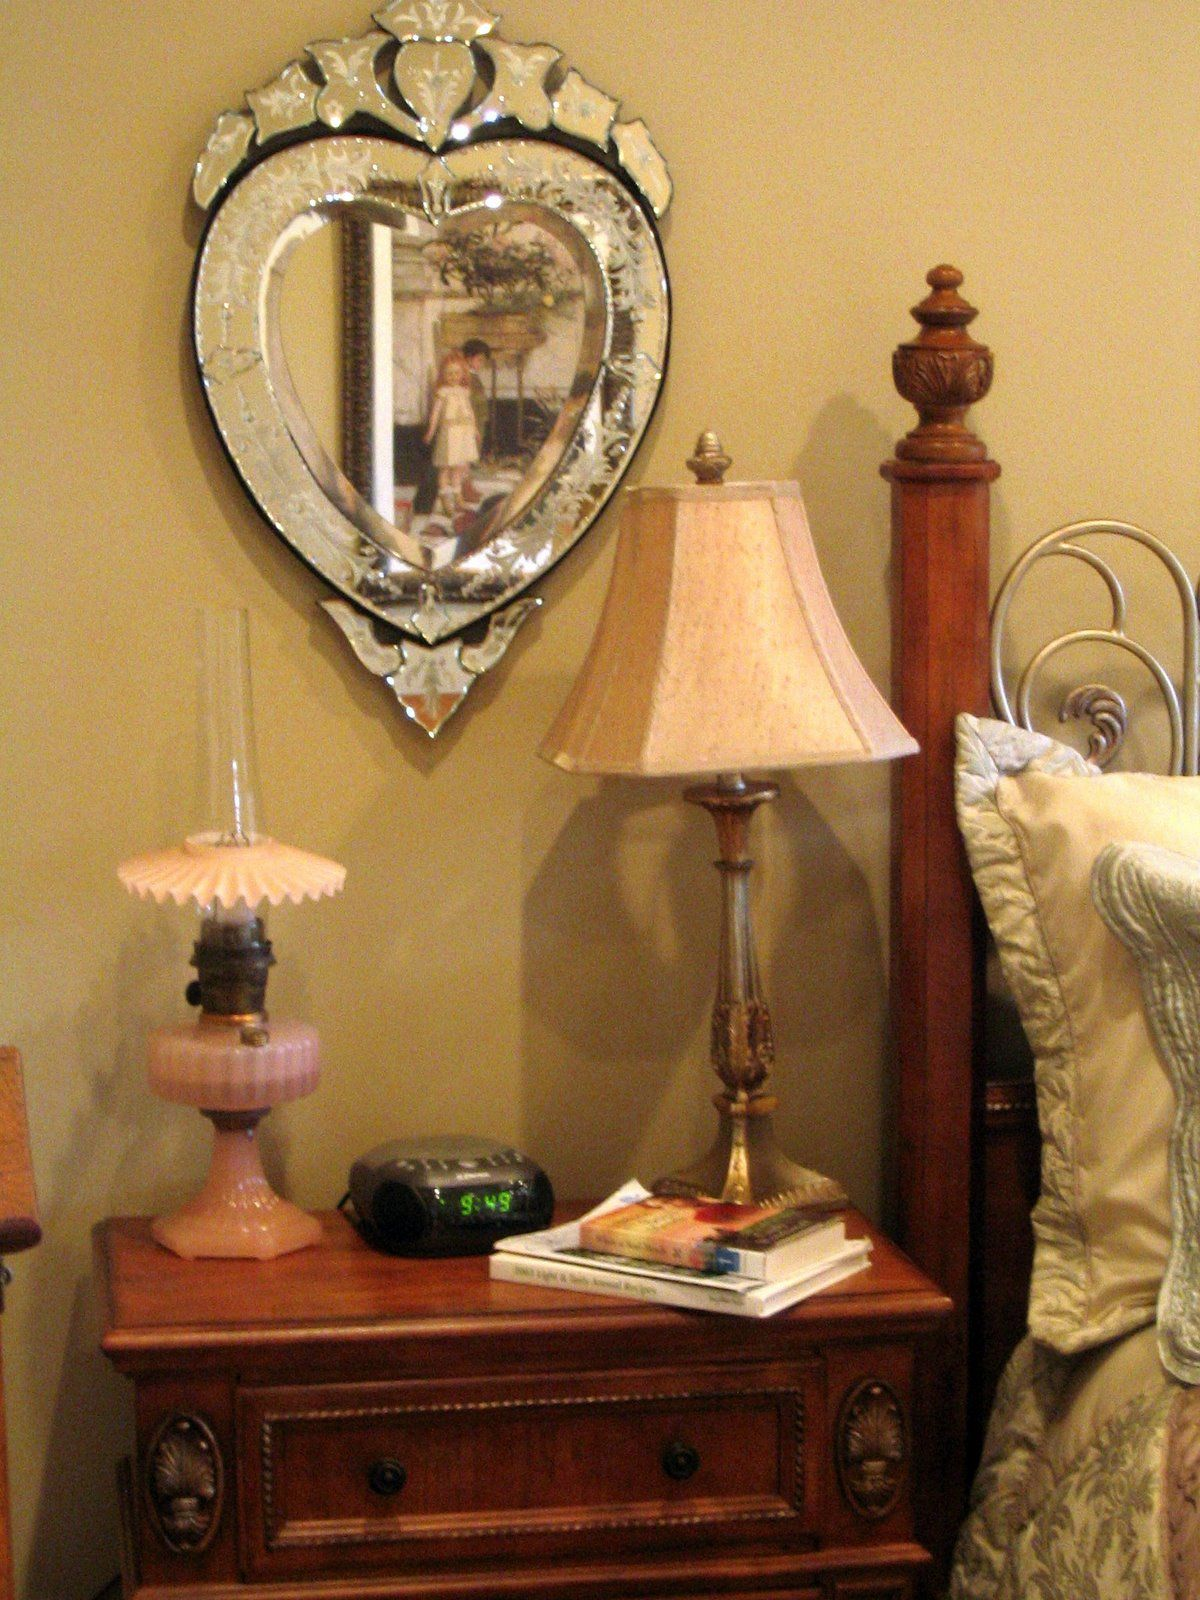 Love Venetian mirrors. Purchased 2 from eBay